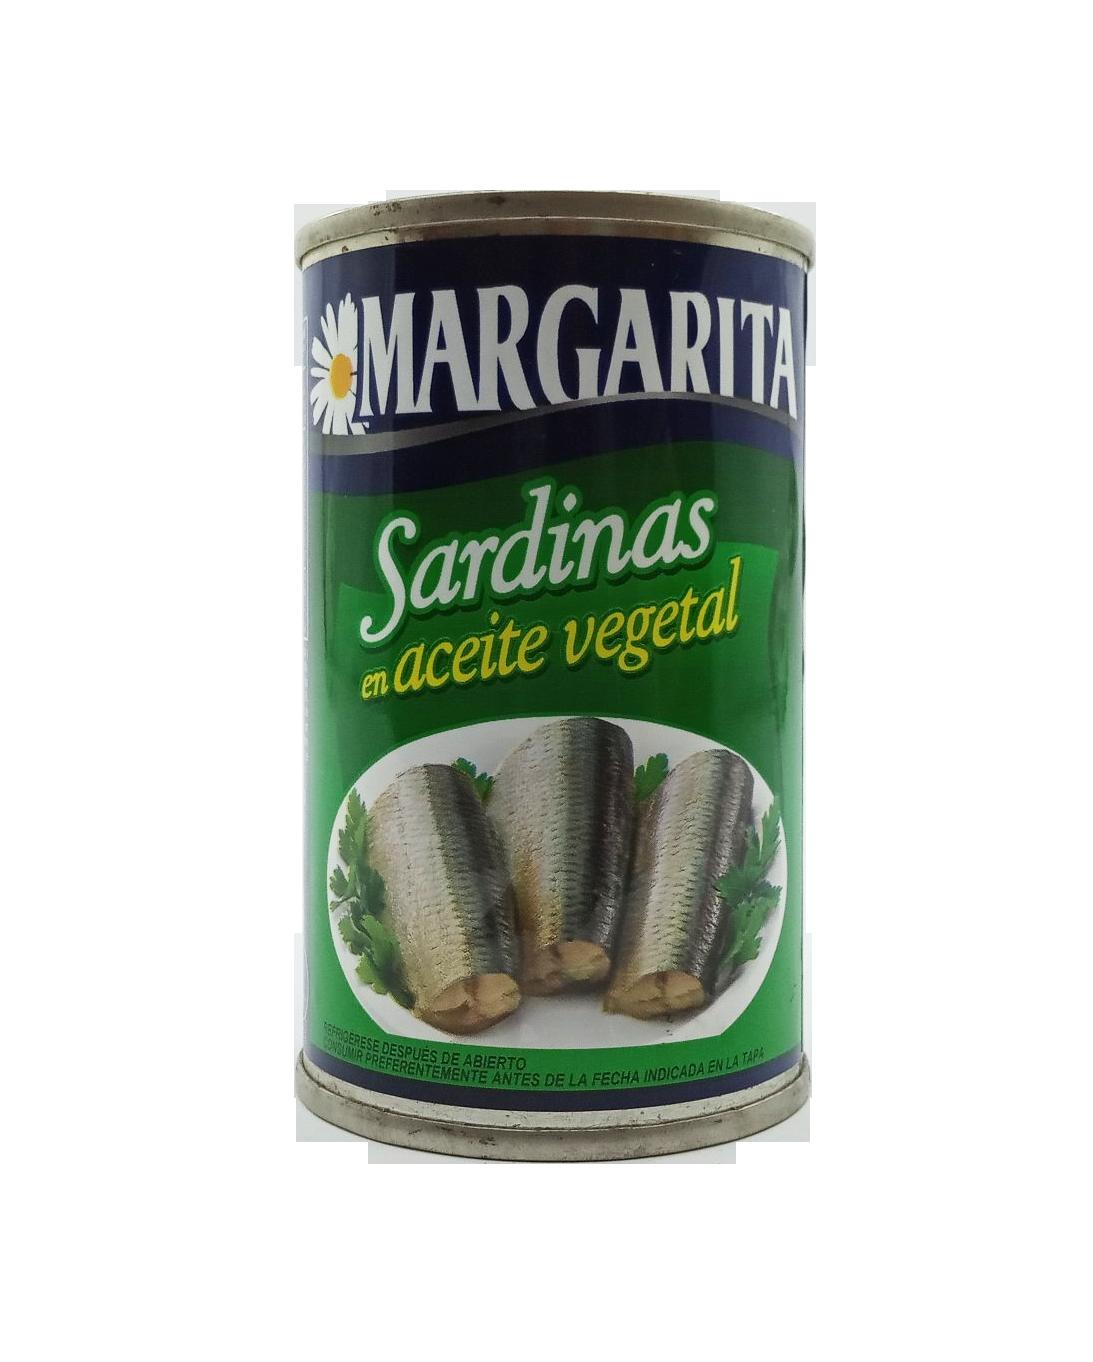 MARGARITA SARDINAS ACEITE VEGETAL 170GR